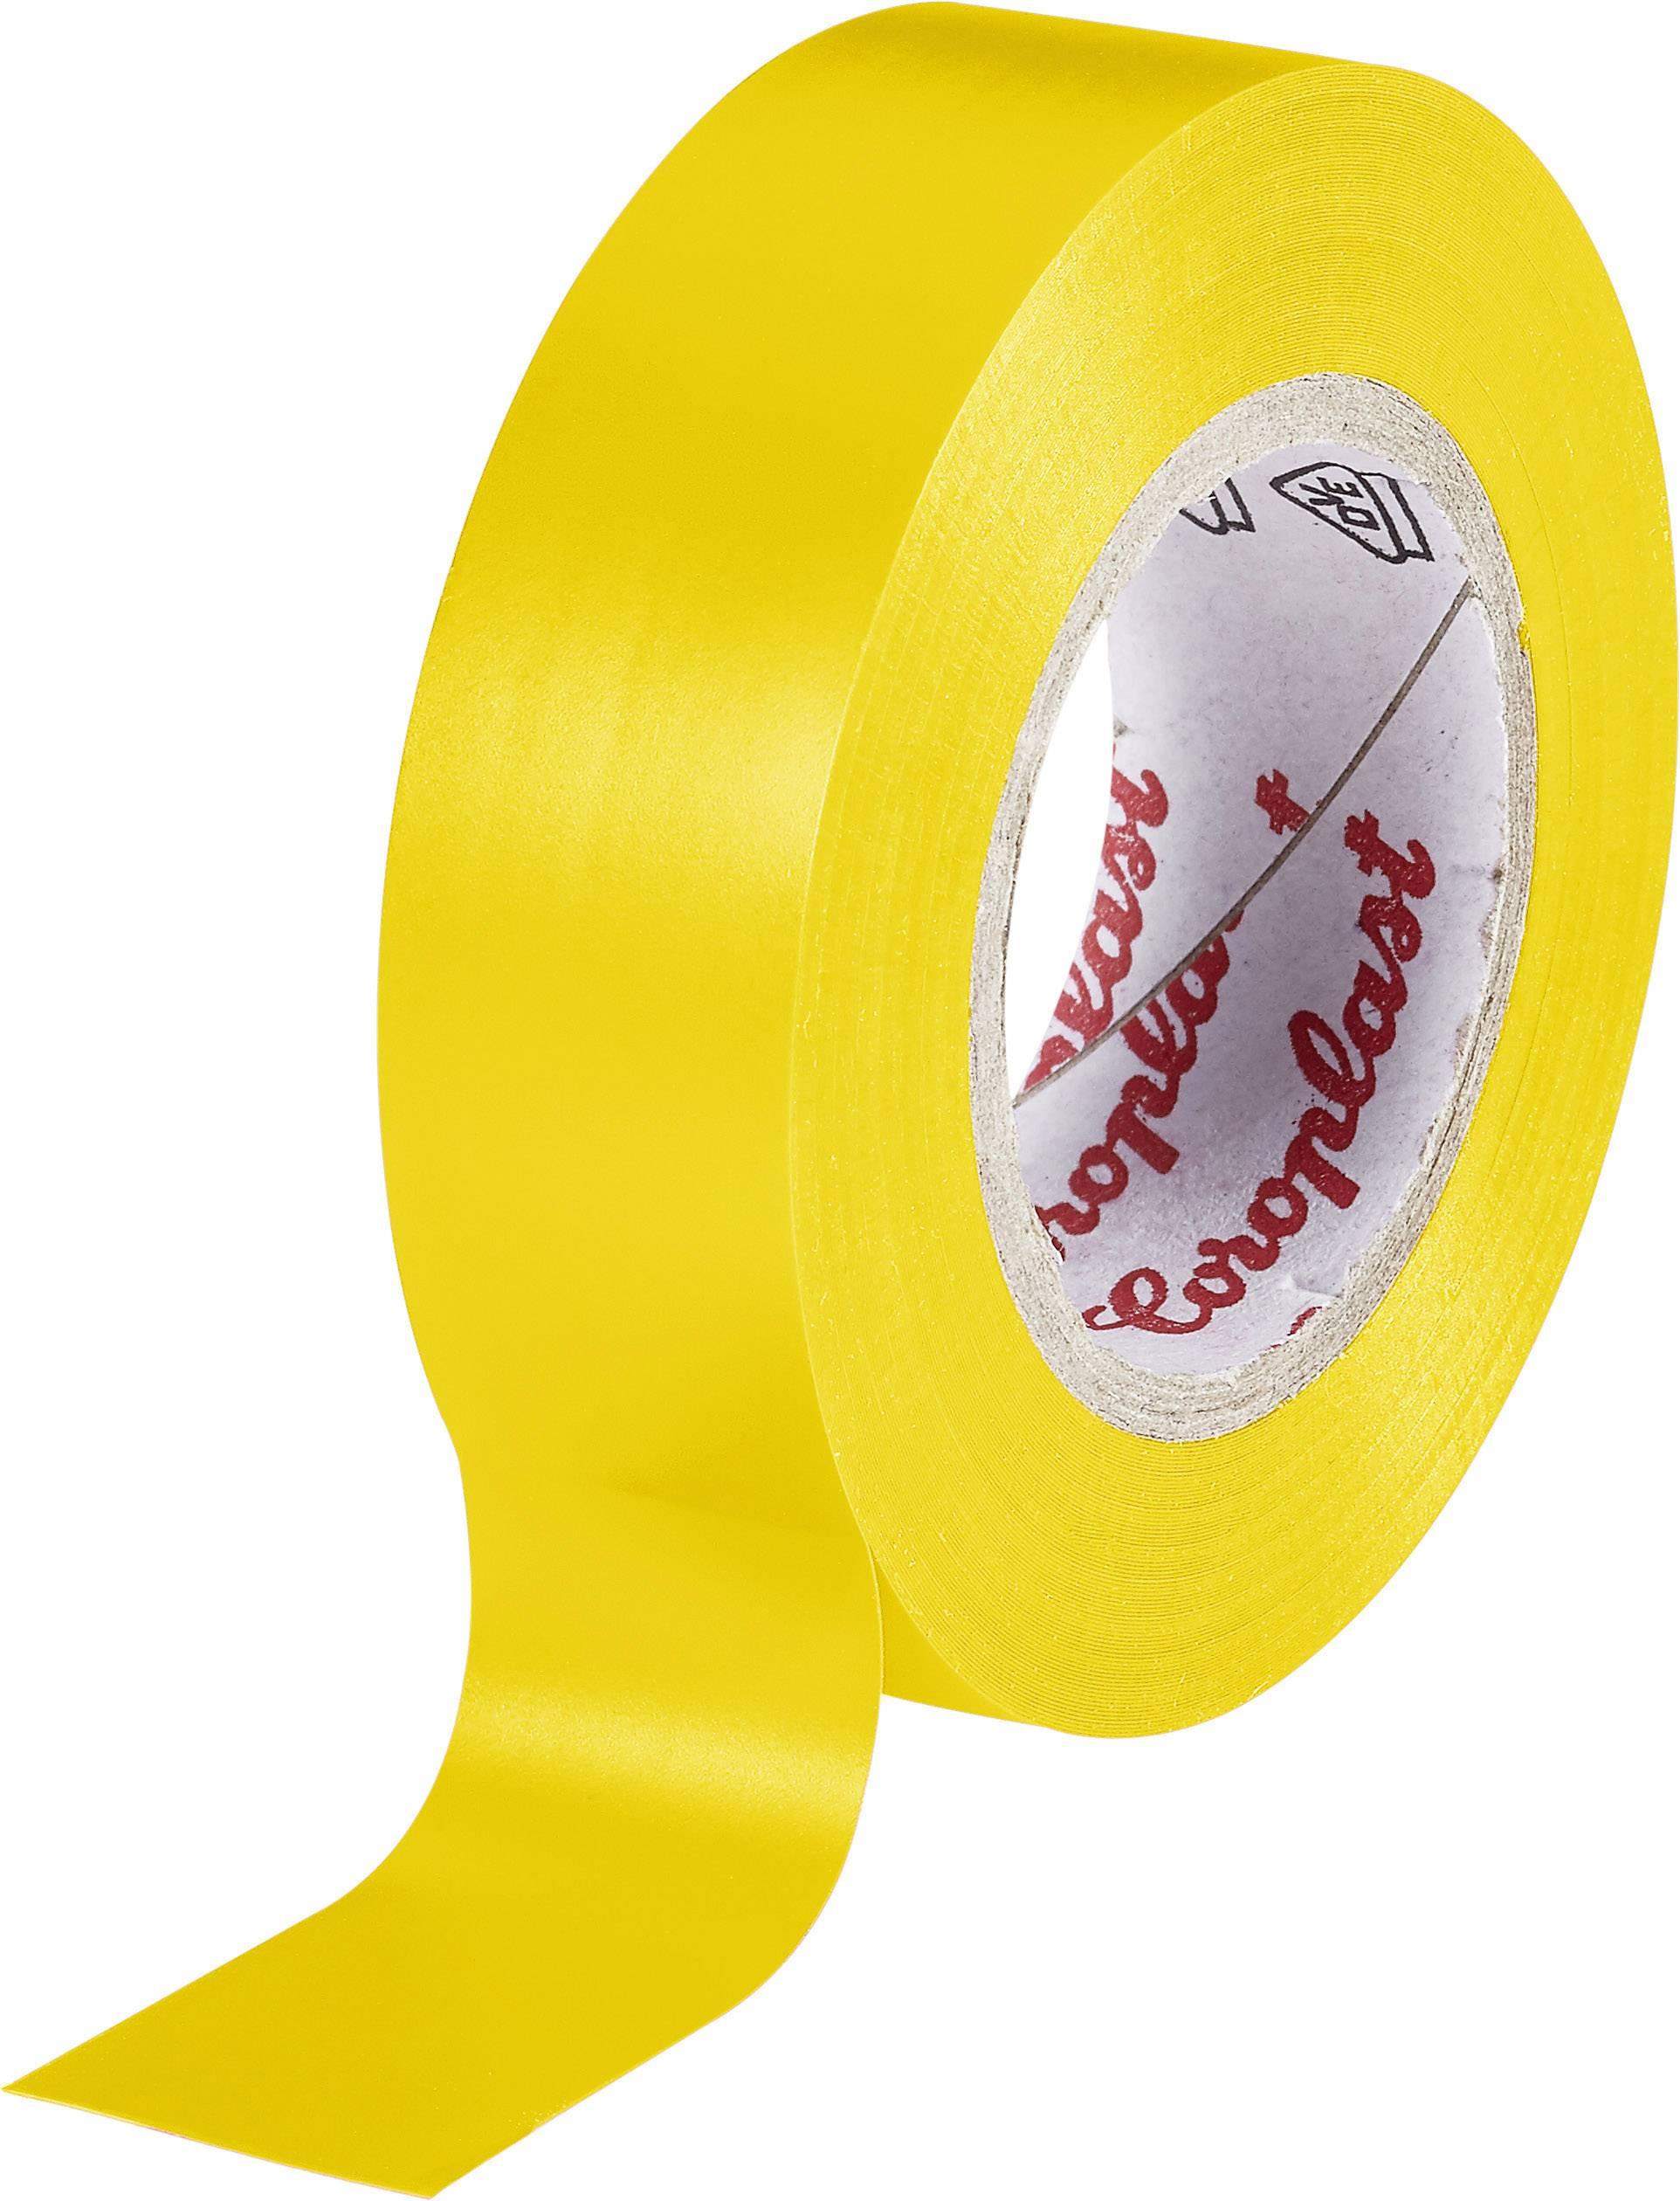 Izolační páska Coroplast, 302, 15 mm x 10 m, žlutá